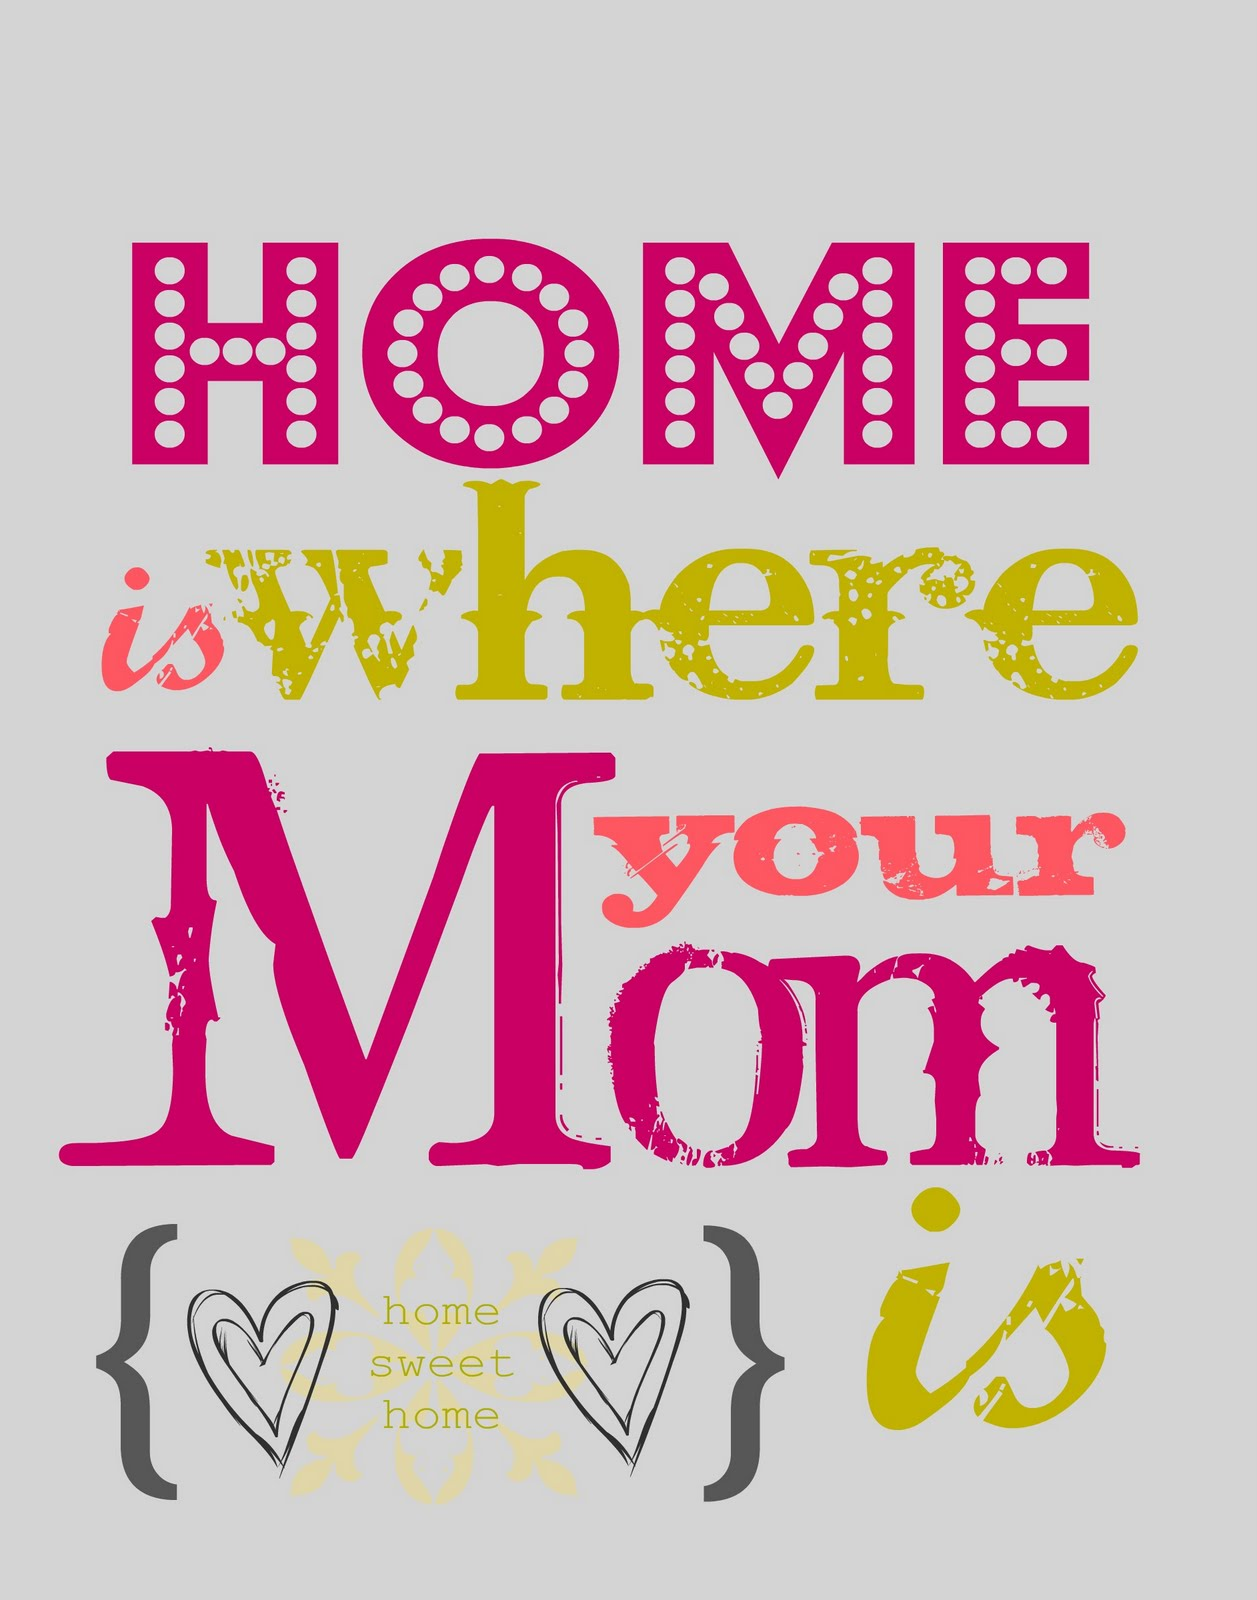 Life's moments: Mps moms